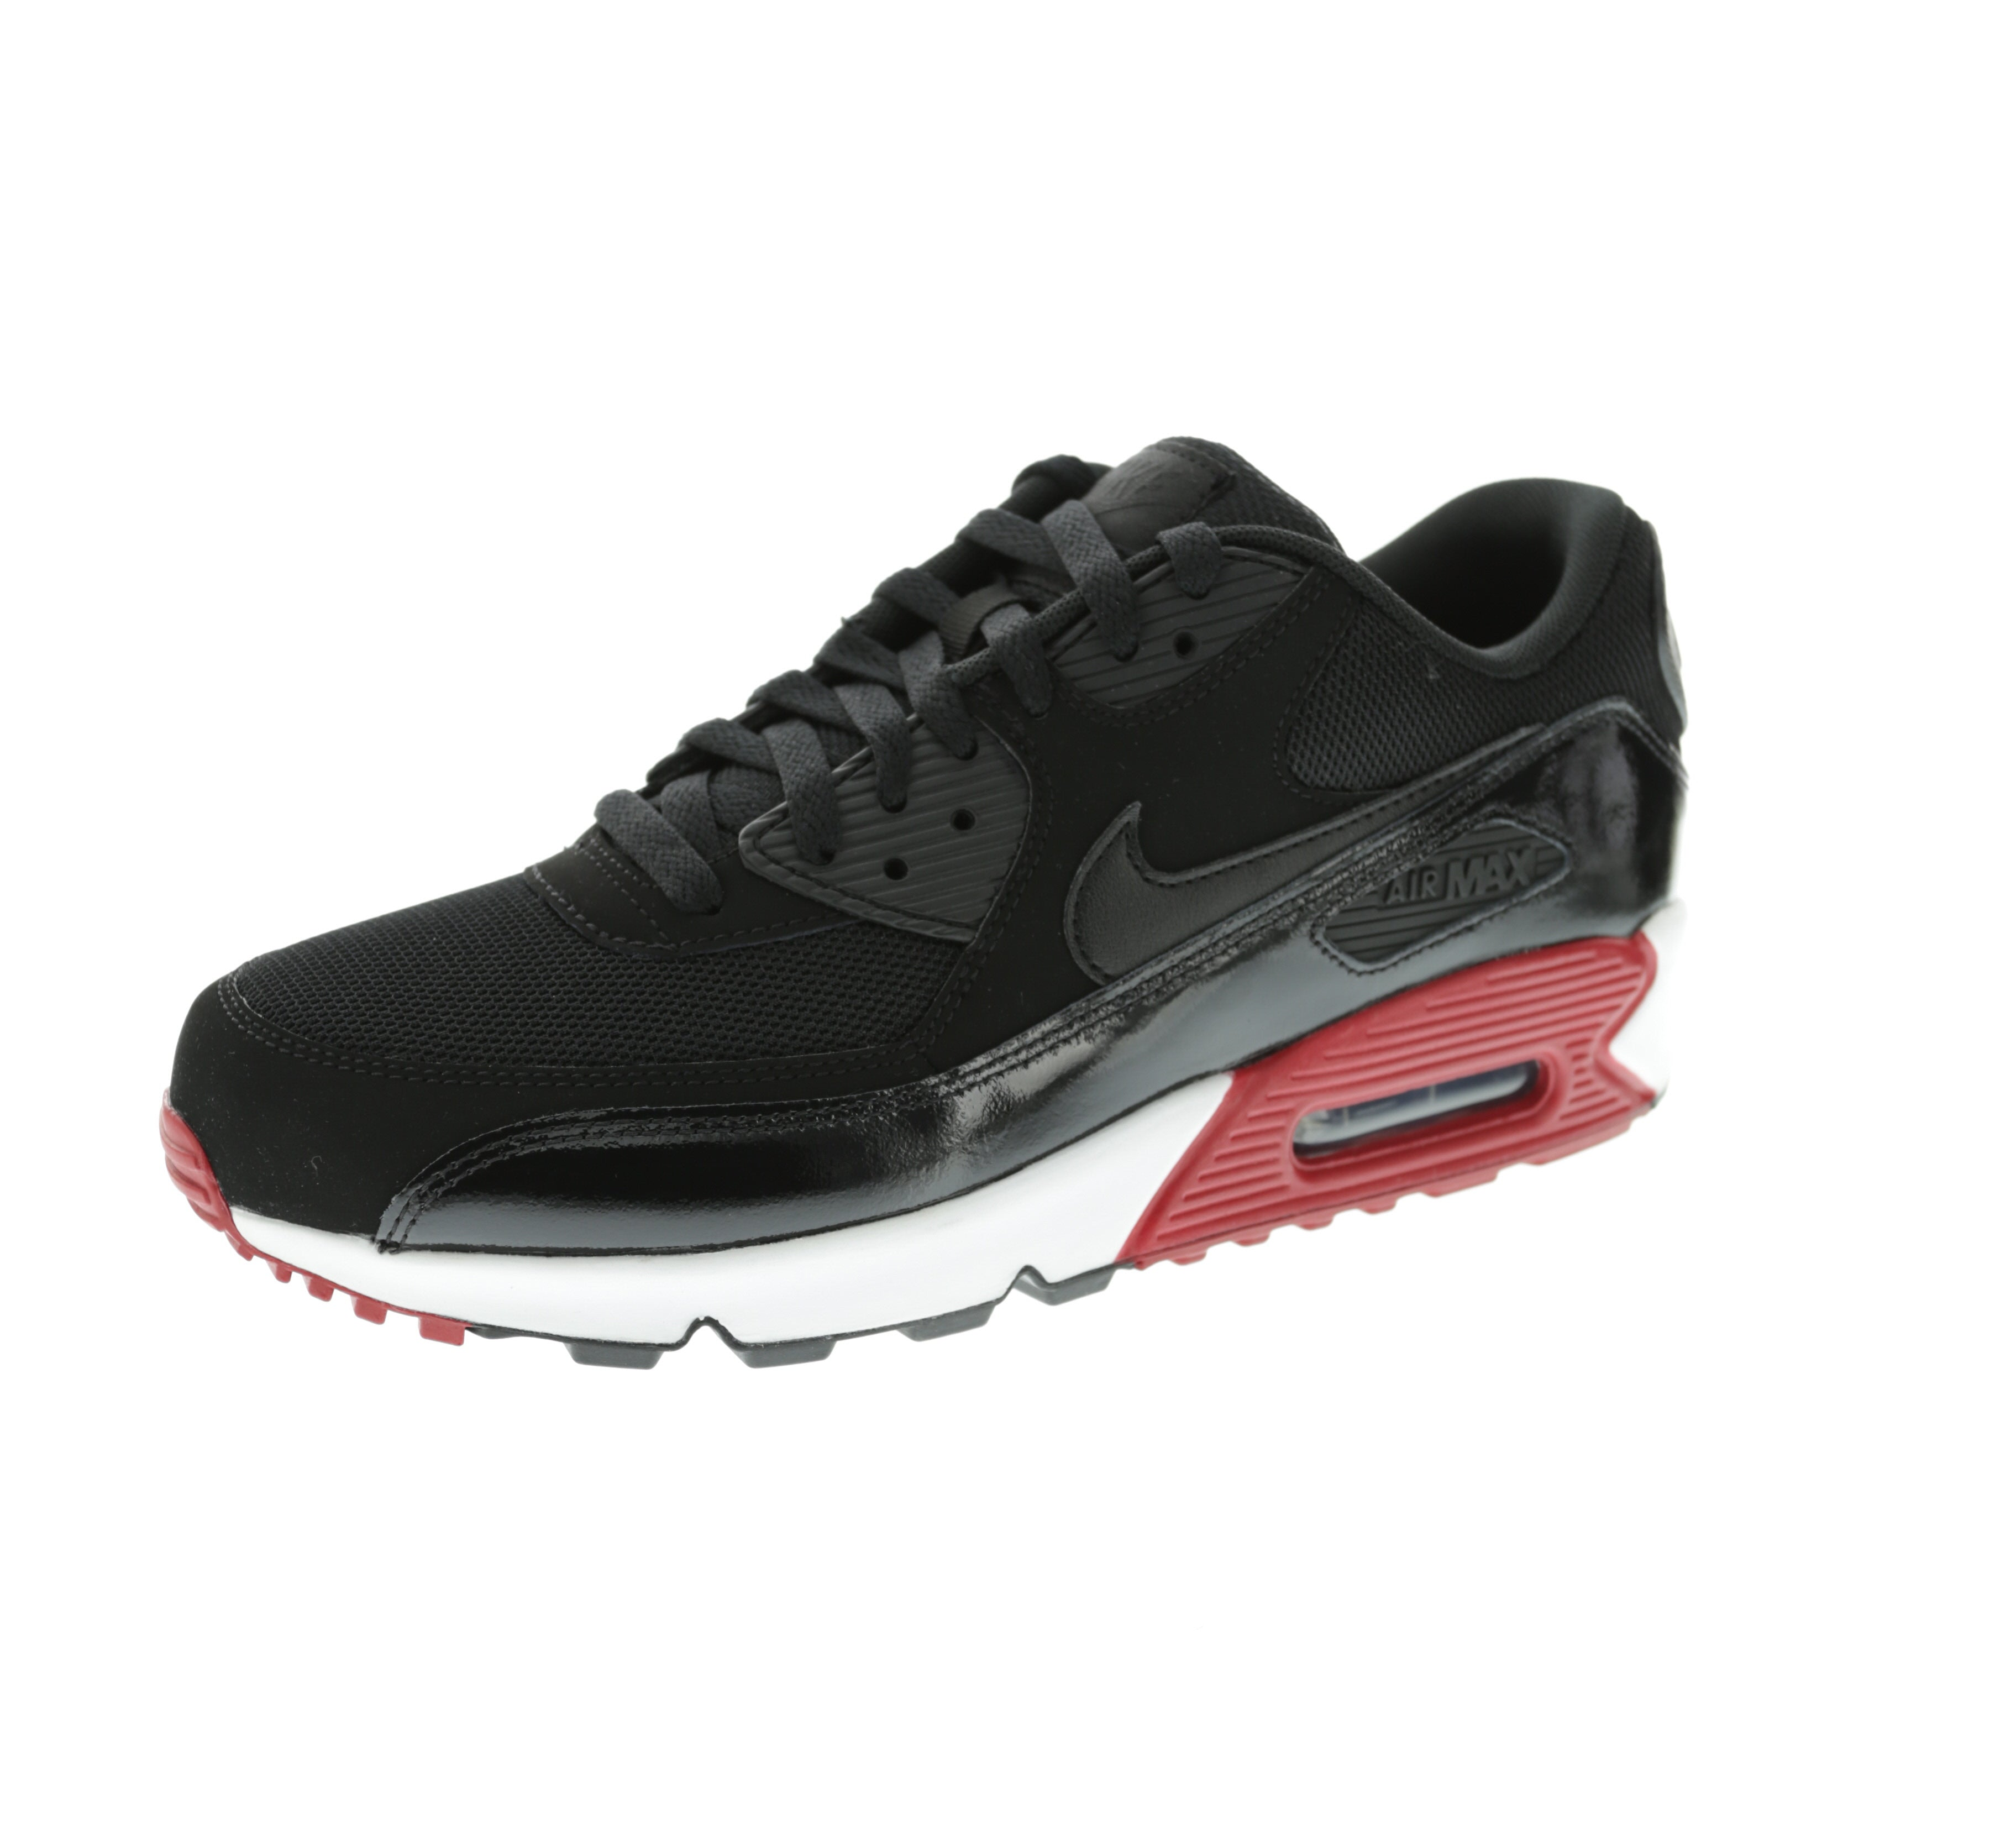 Nike Air Max 90 Essential BlackWhiteRed